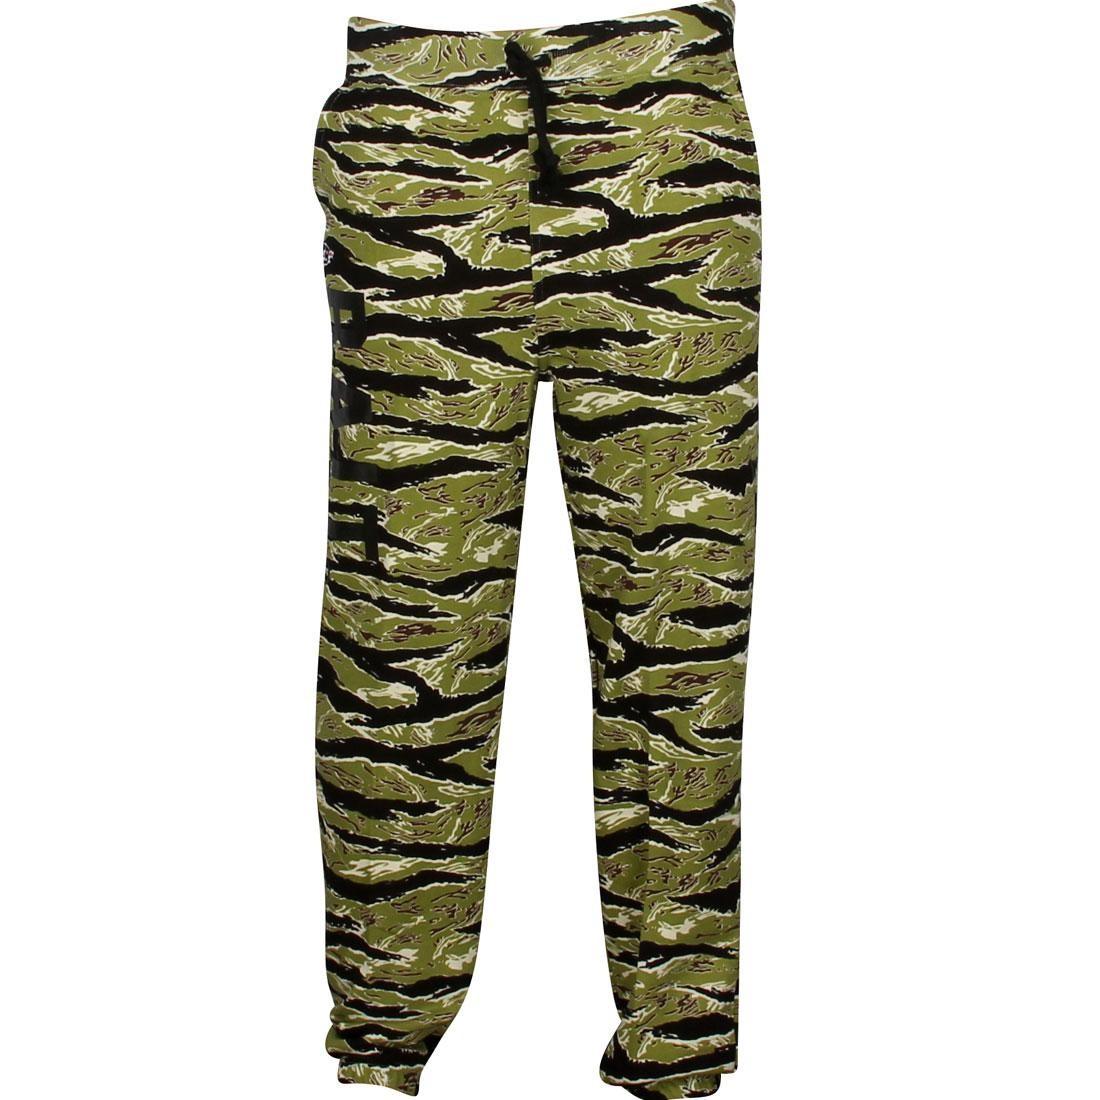 【 BAIT BASICS SWEATPANTS CAMO TIGER 】 メンズファッション ズボン パンツ 送料無料